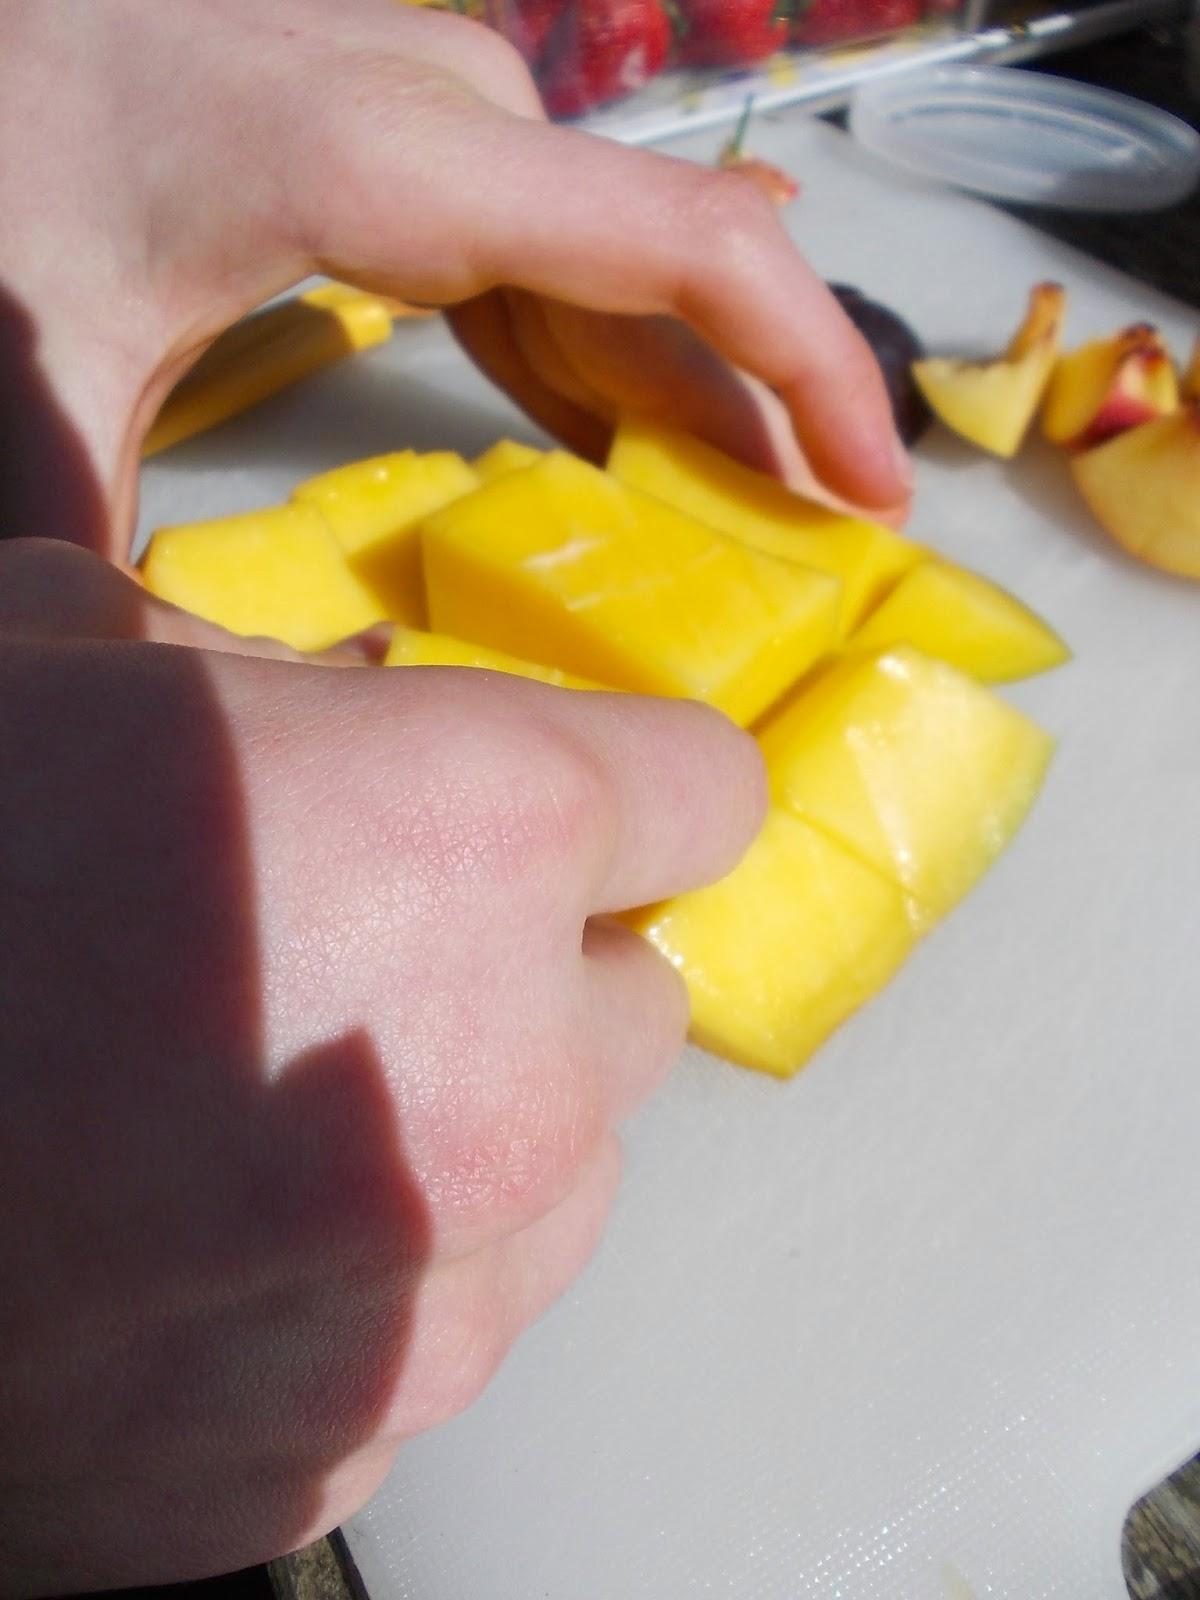 fruit ninja how to get all 3 bananas at once